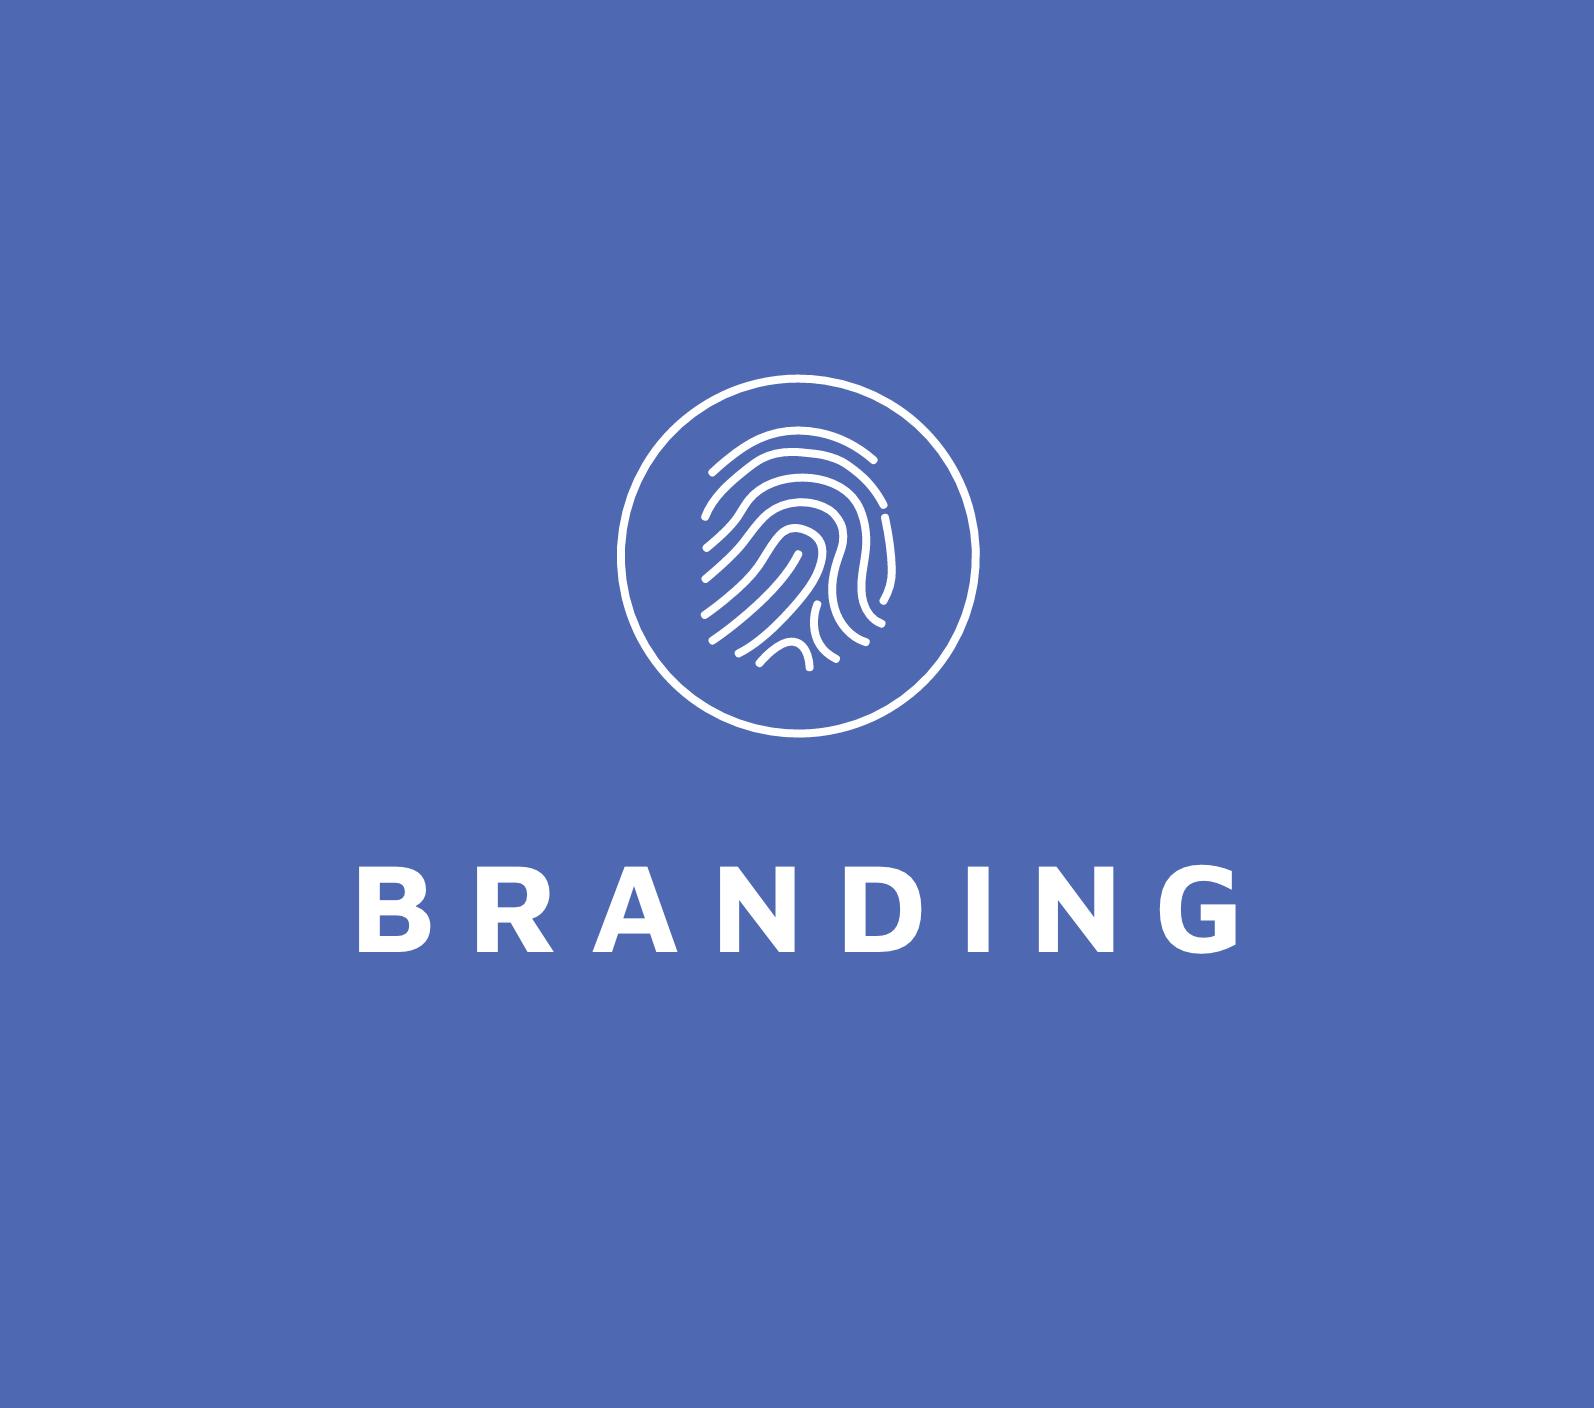 Branding_cb@2x